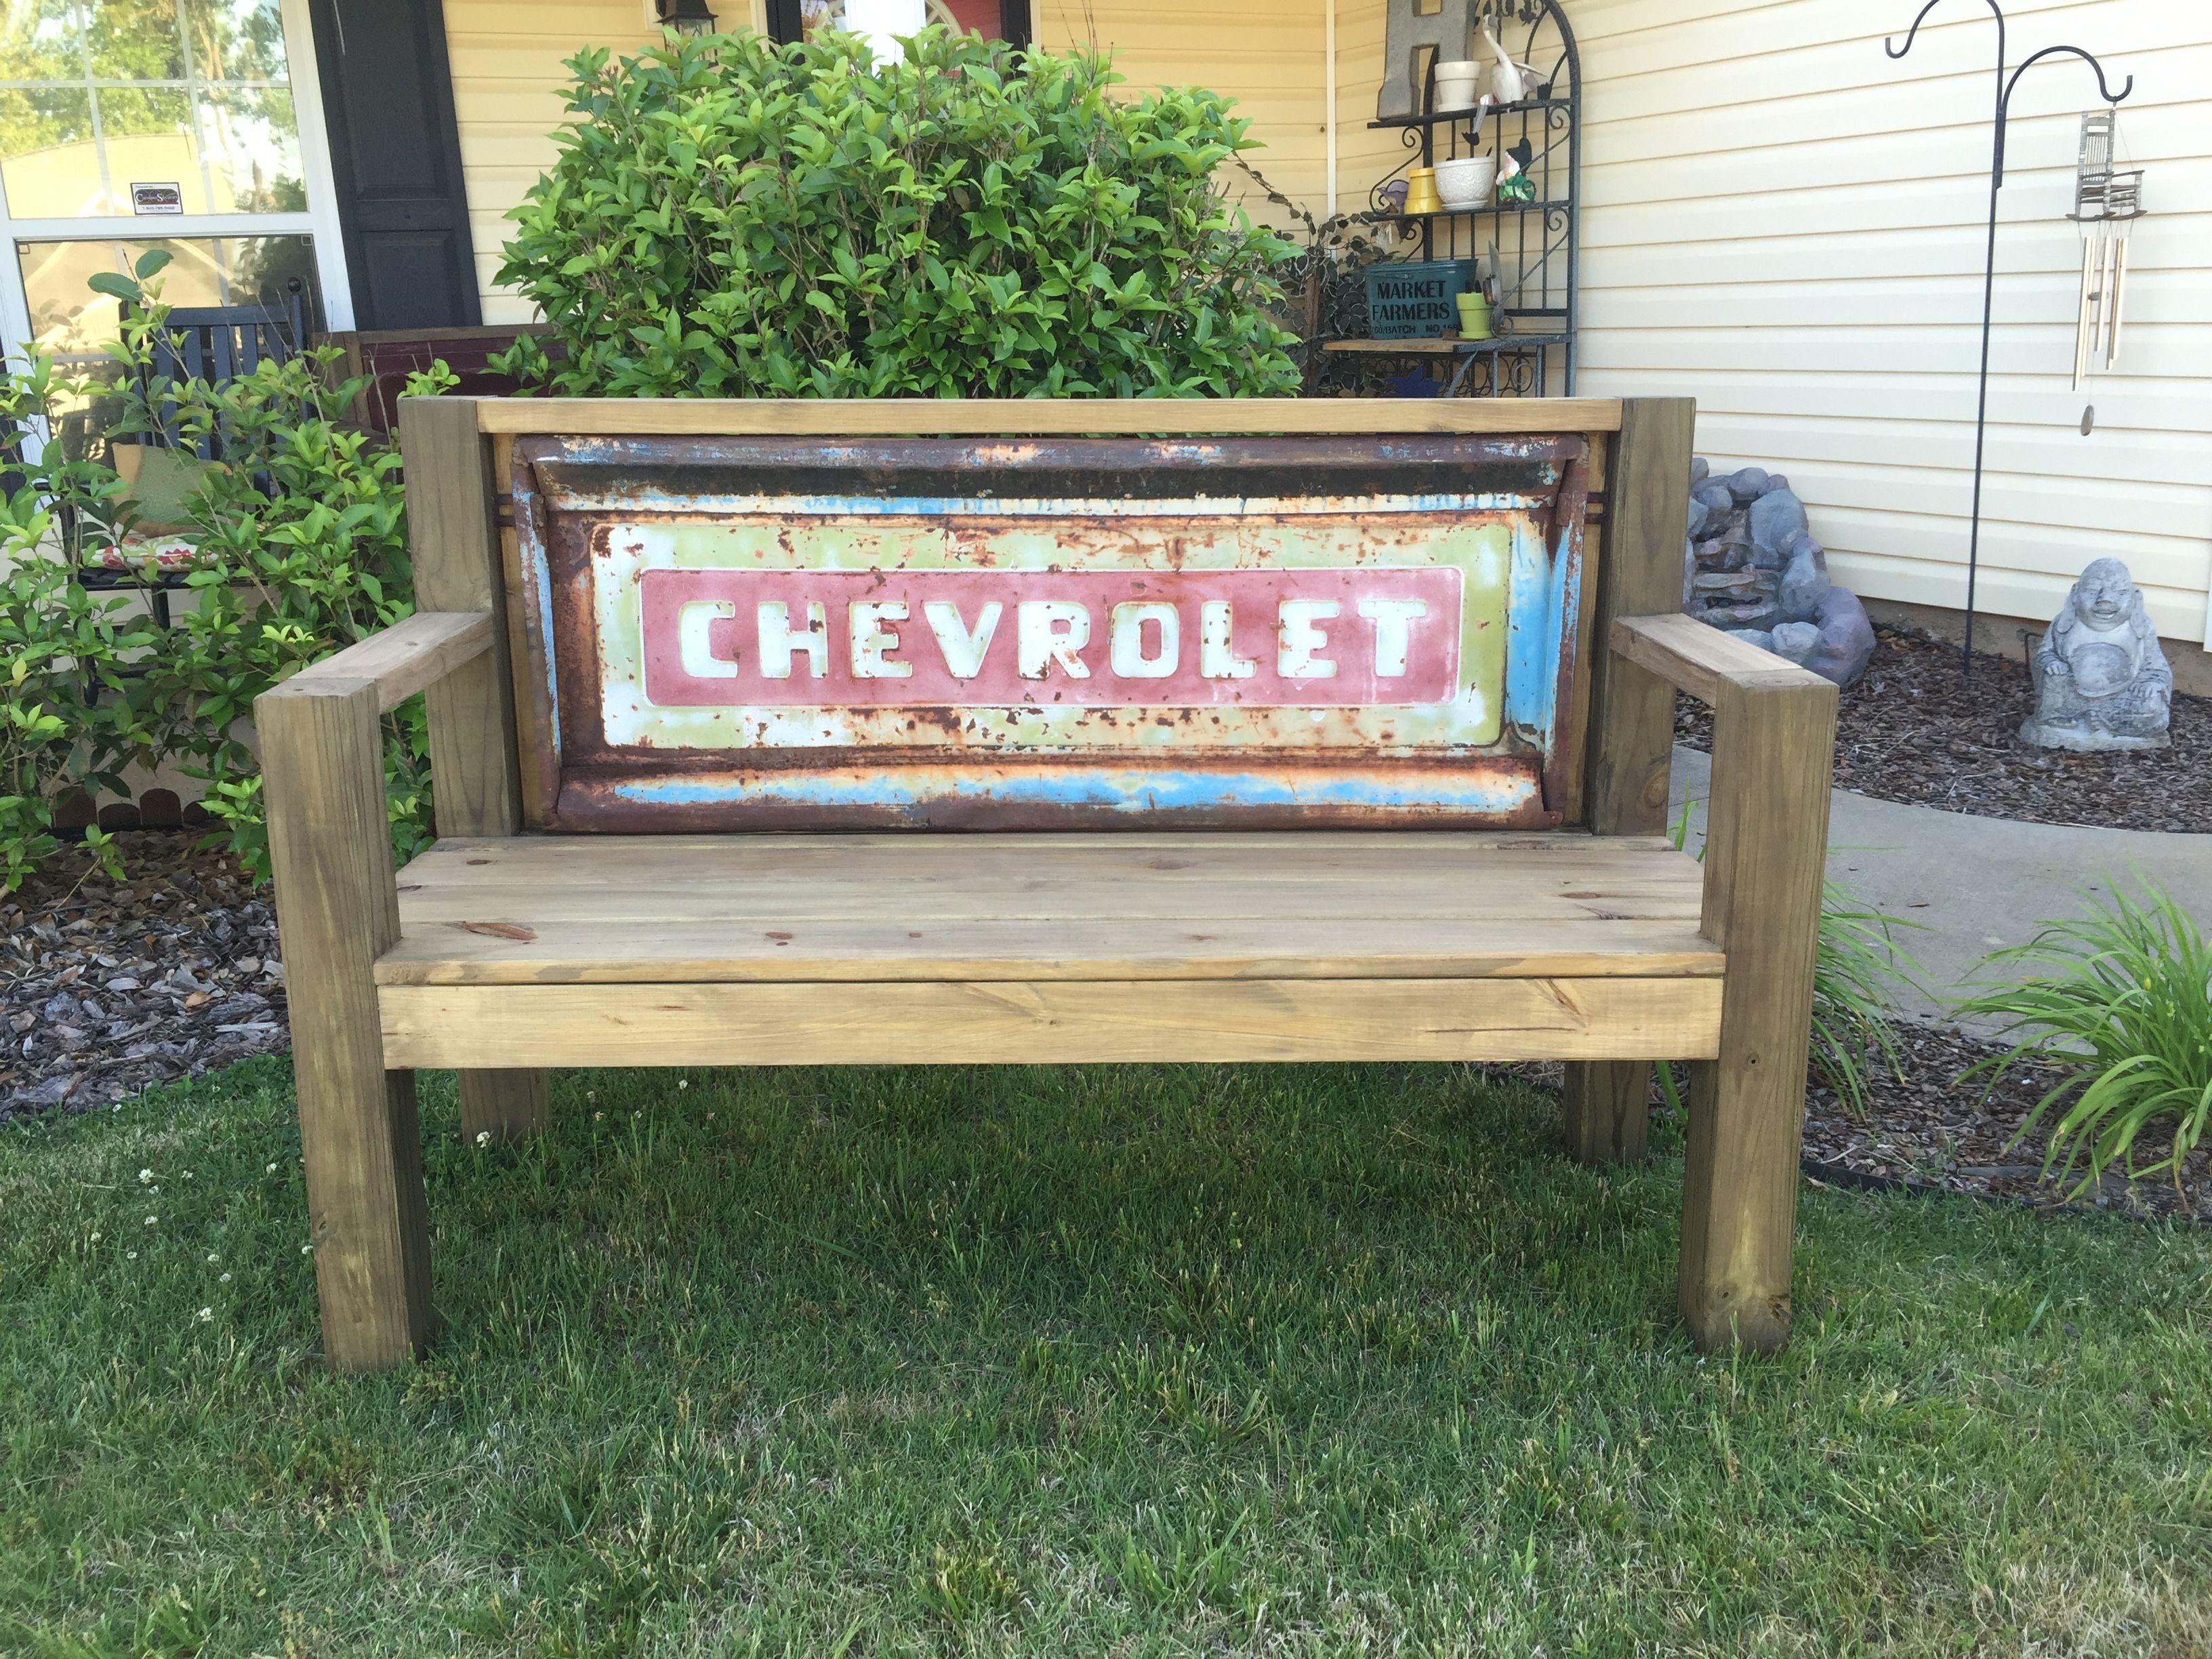 Chevy C10 Tailgate bench  handyhinch.com  Facebook.com/handyhinch